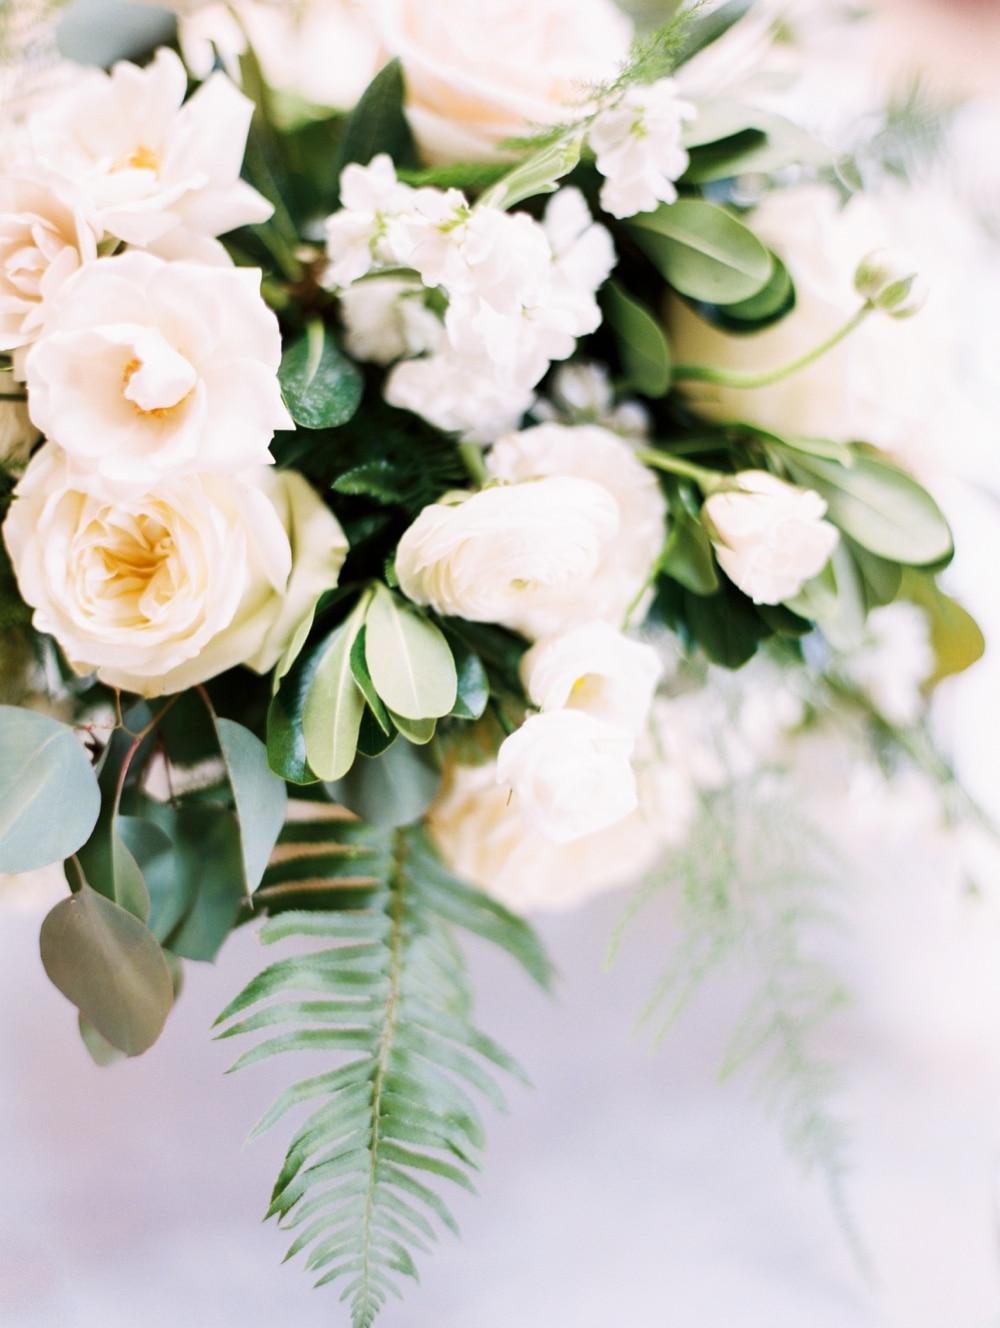 kristin-la-voie-photography-Cafe-Brauer-Chicago-Wedding-Photographer-64